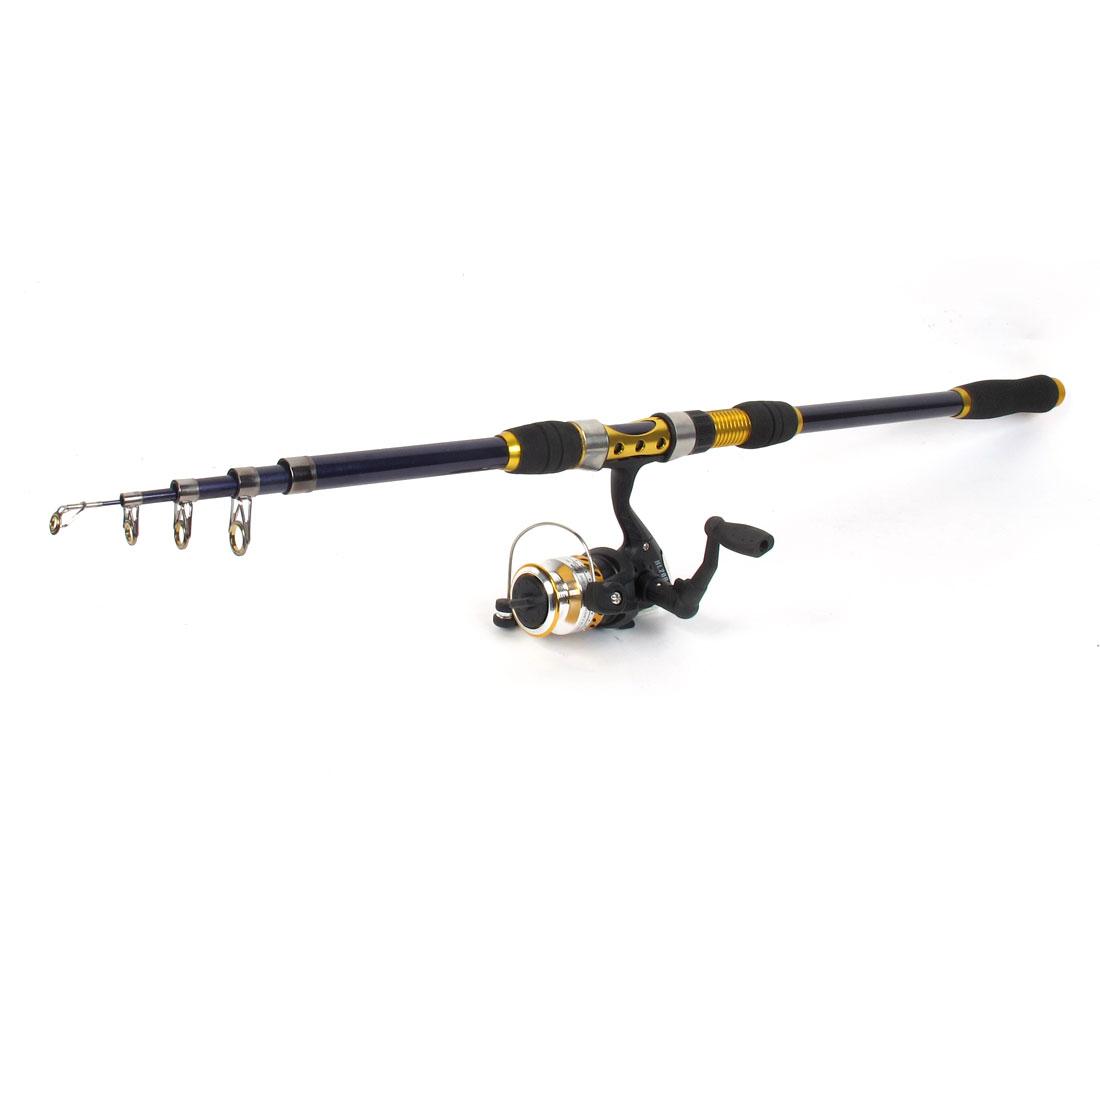 2.1M Telescopic Carbon Fiber Retractable Fishing Rod Pole w Spinning Reel Conmbo